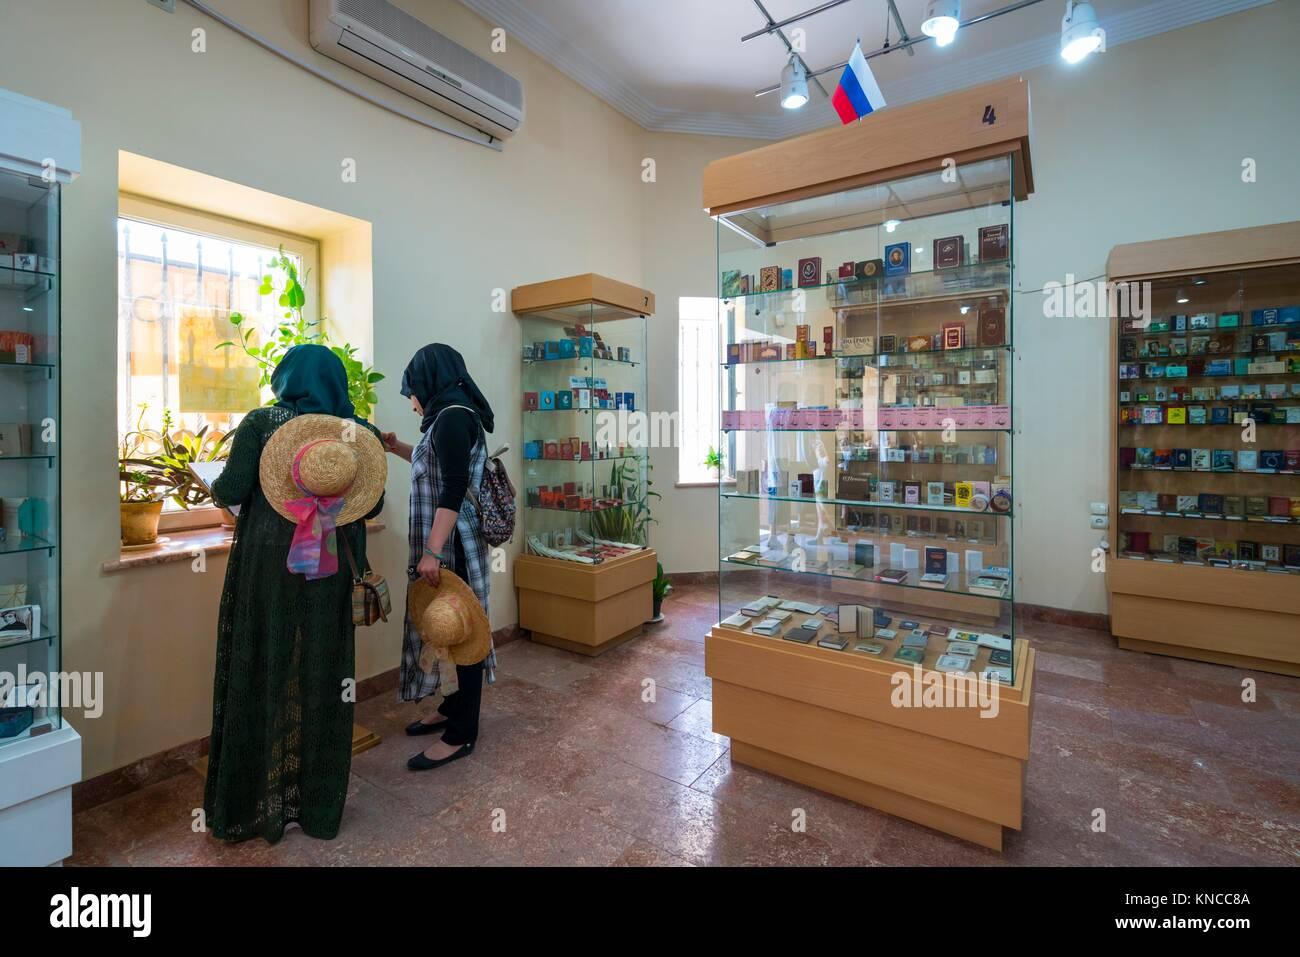 Miniature Book Museum, Old City, Baku City, Azerbaijan, Middle East. - Stock Image